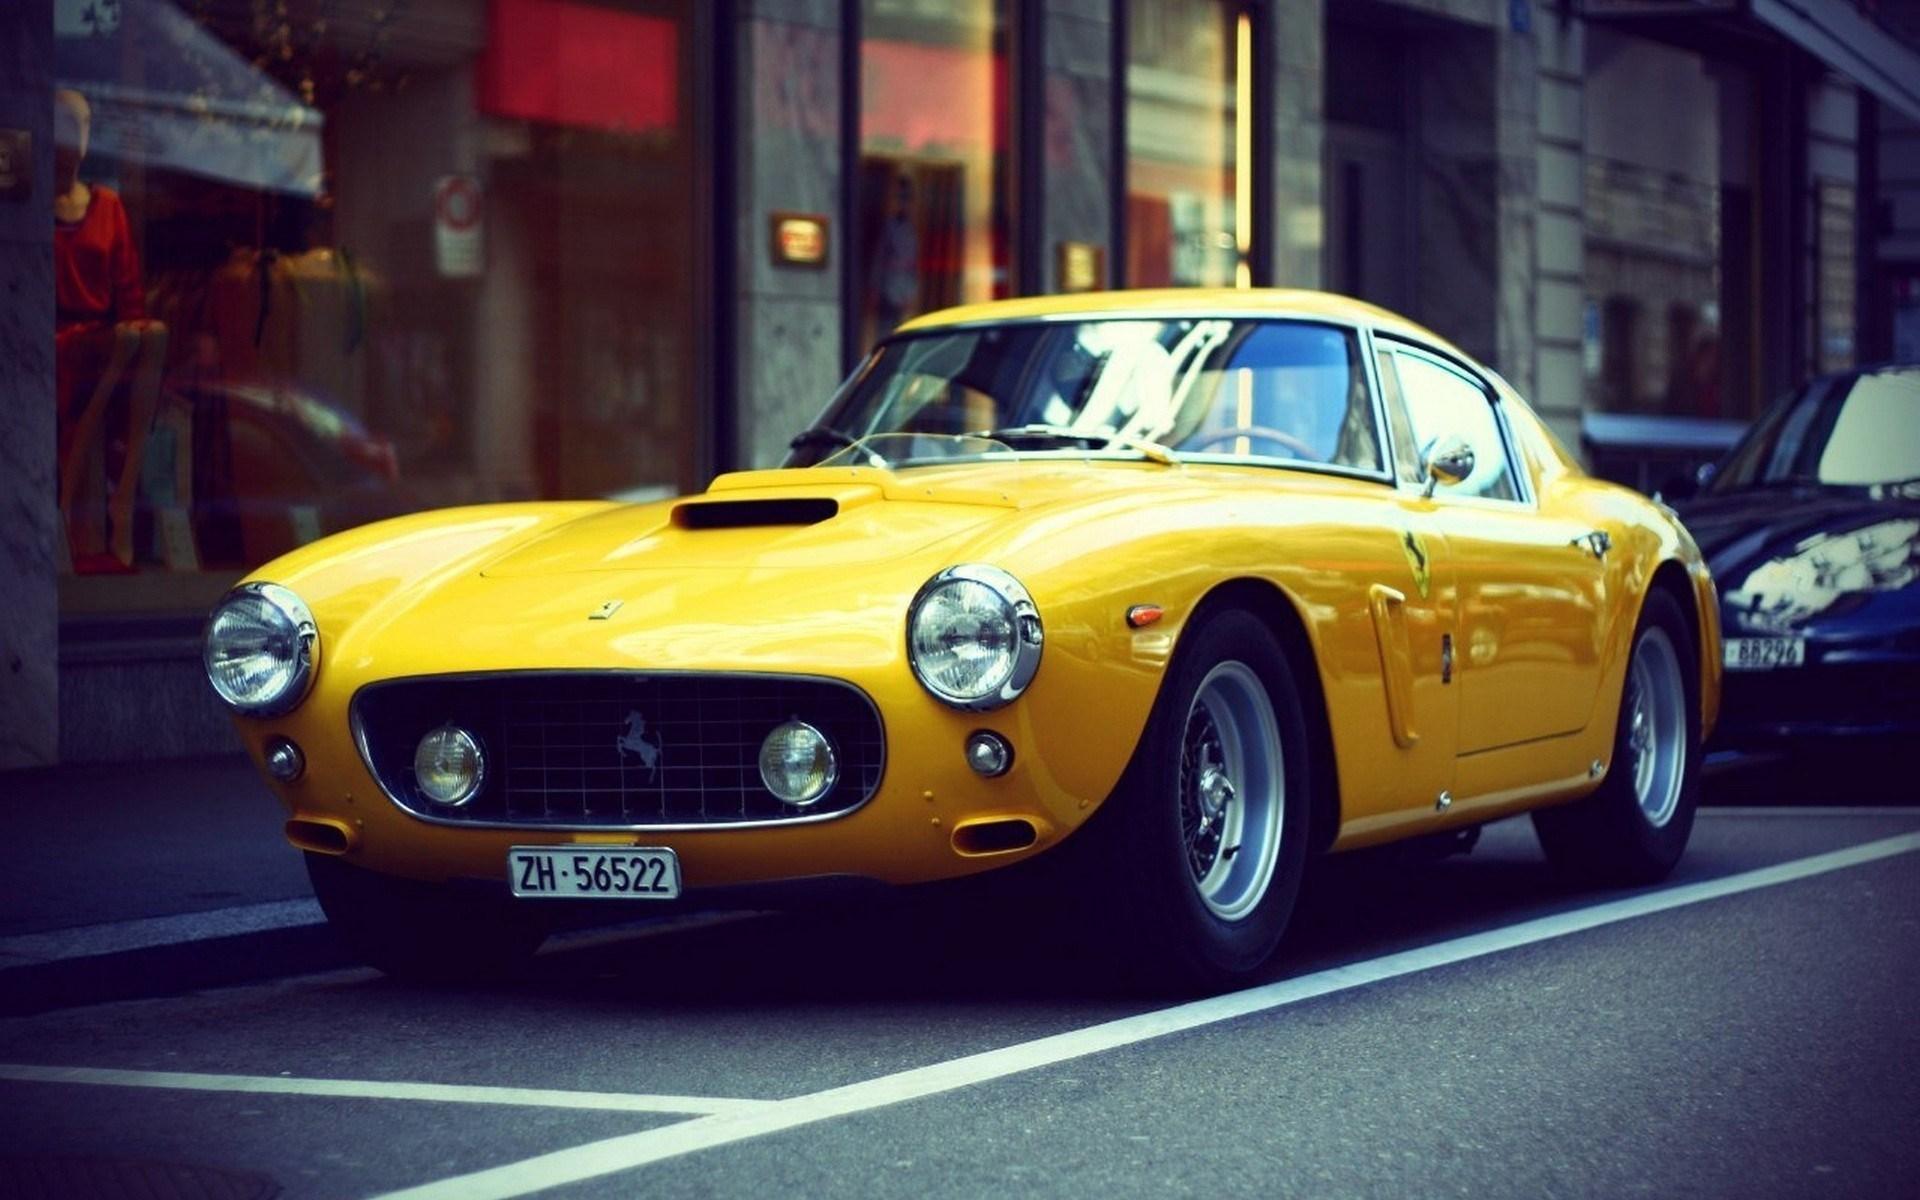 Ferrari Yellow Classic Car HD Wallpaper